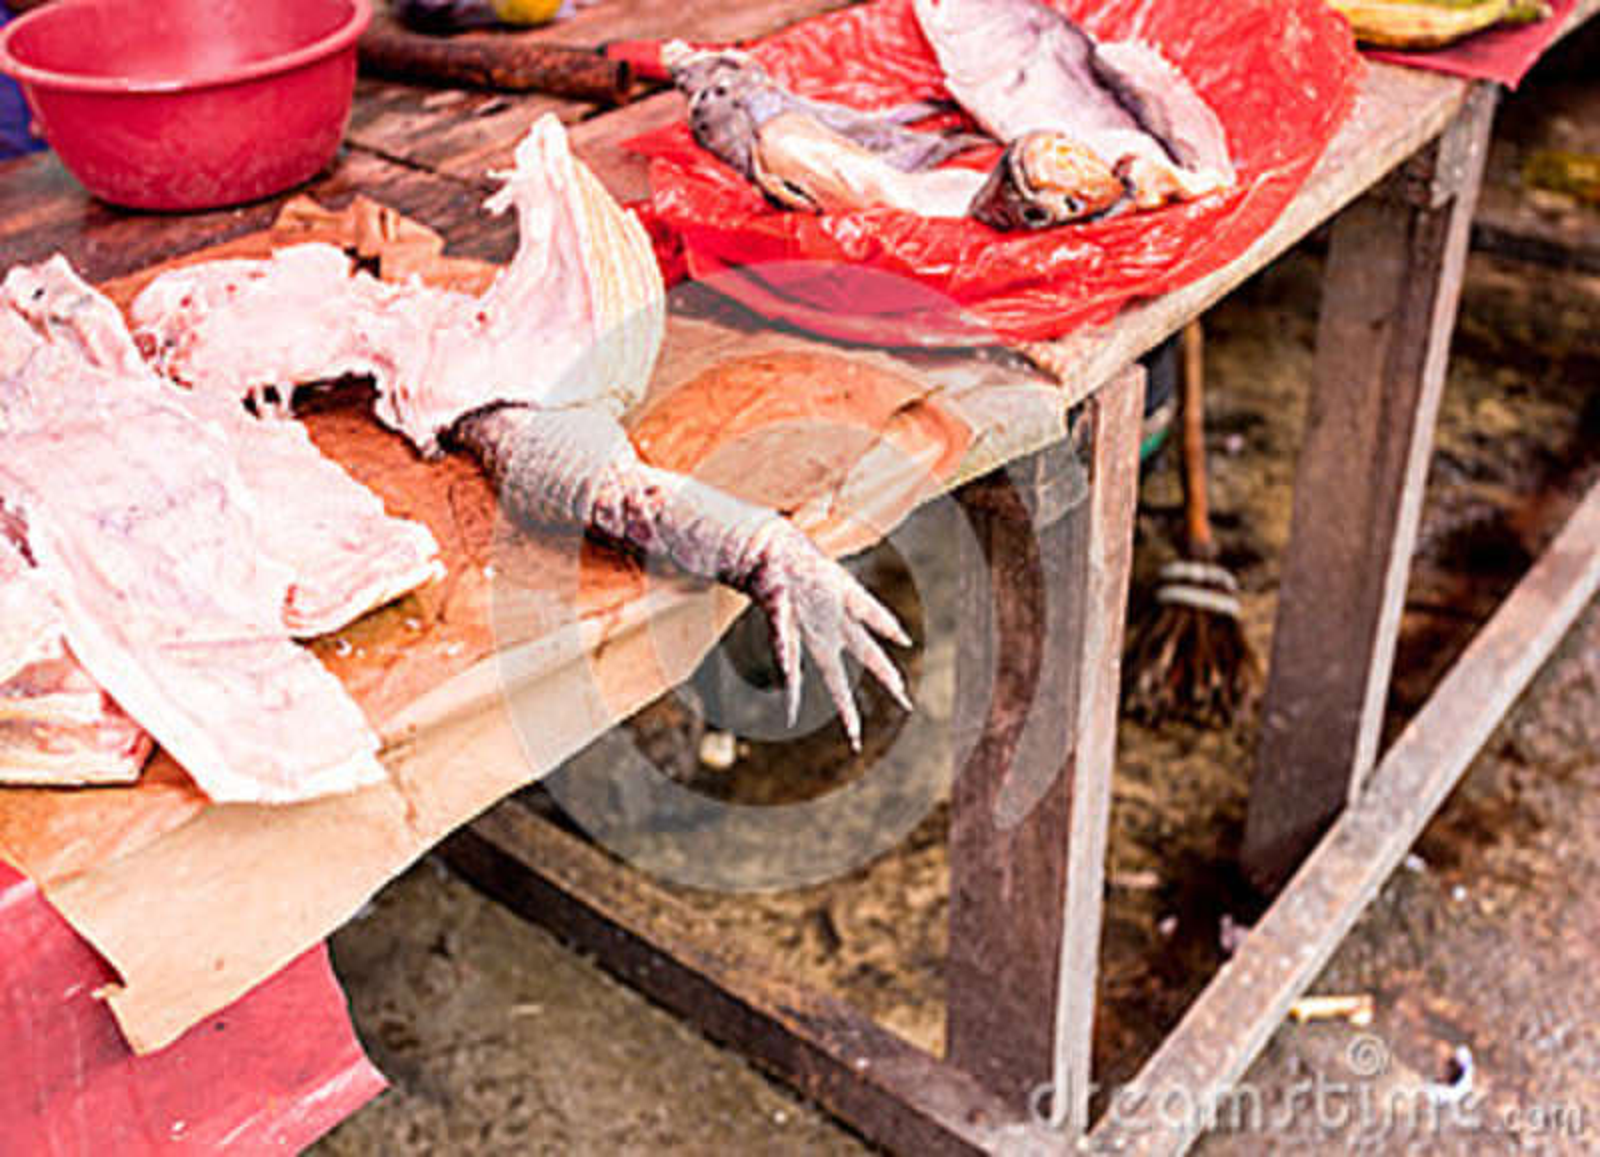 Мясо аллигатора на рынке Belen, Iquitos, Перу